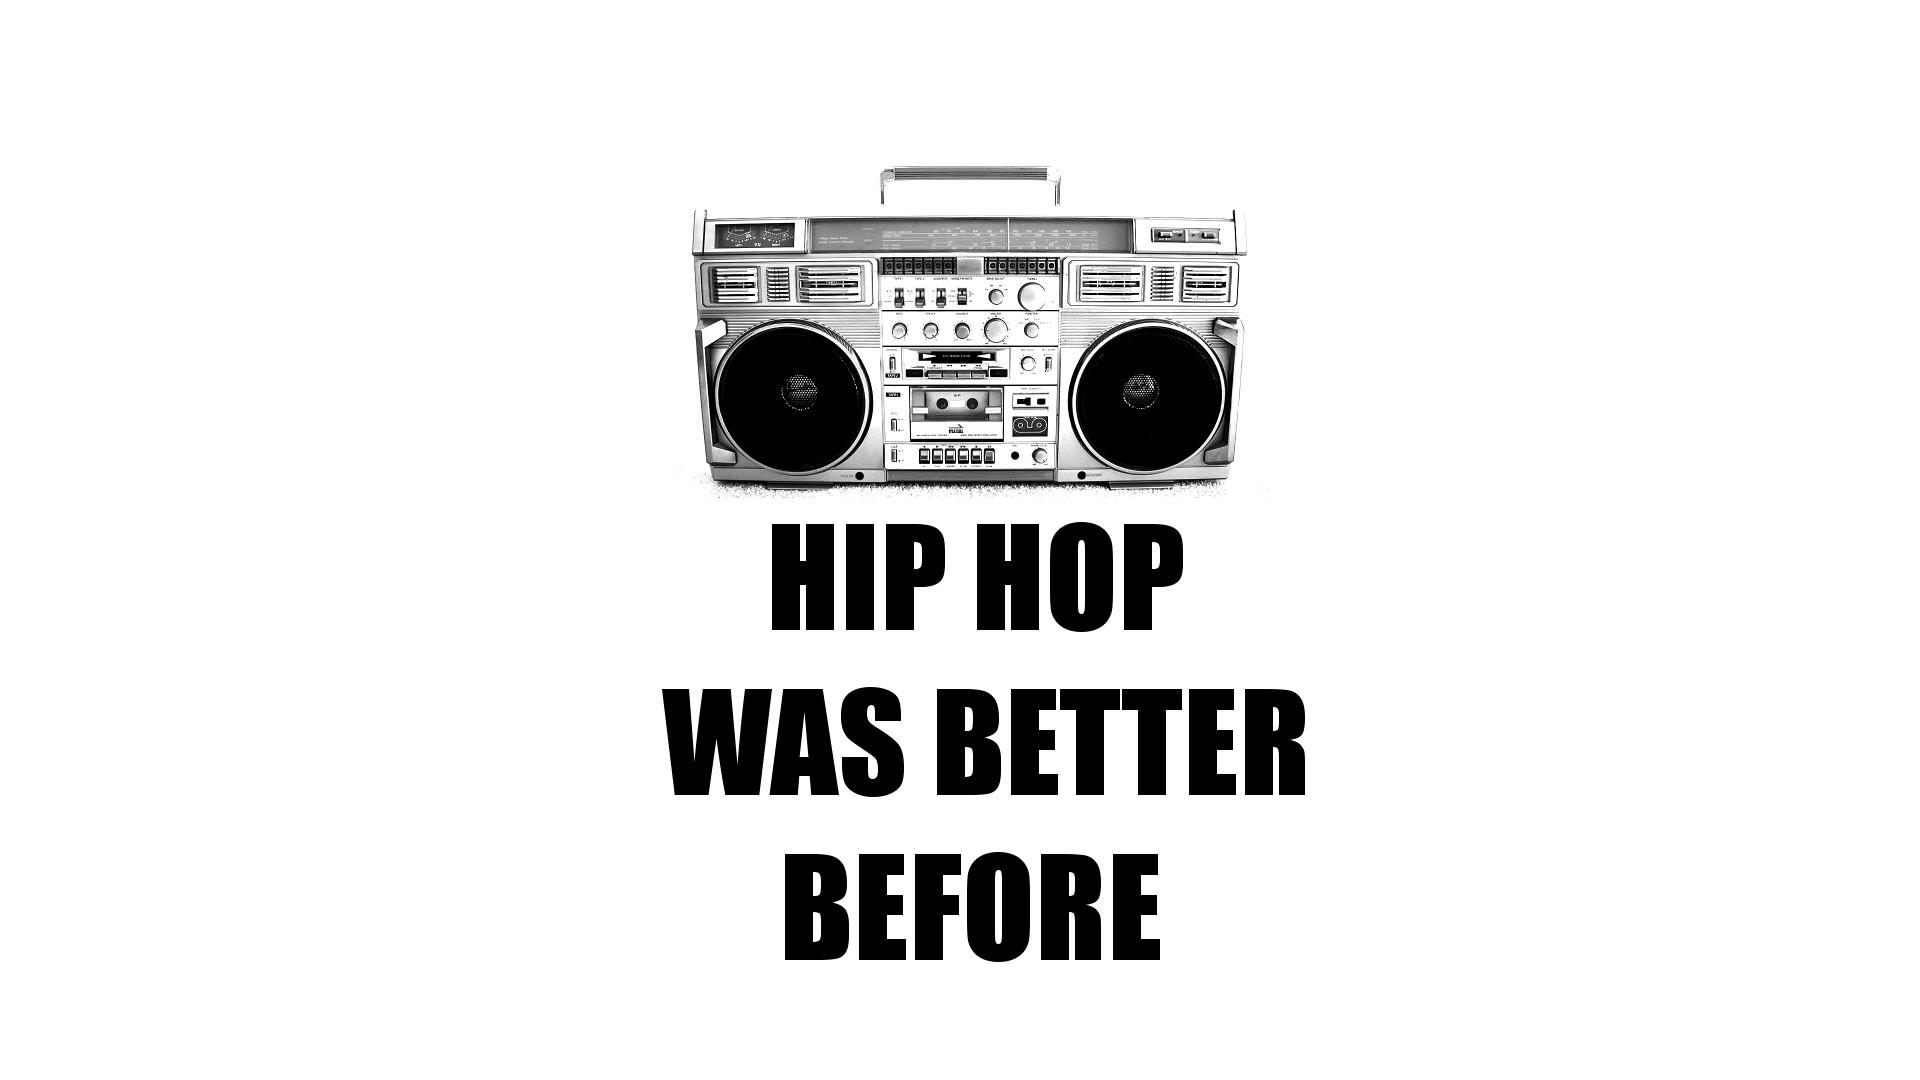 Boom Bap Box Cassette Deck Hip-hop Mc Microphone Nyc Old School Skool Rap  Reel To Retro RUN DMC Vintage